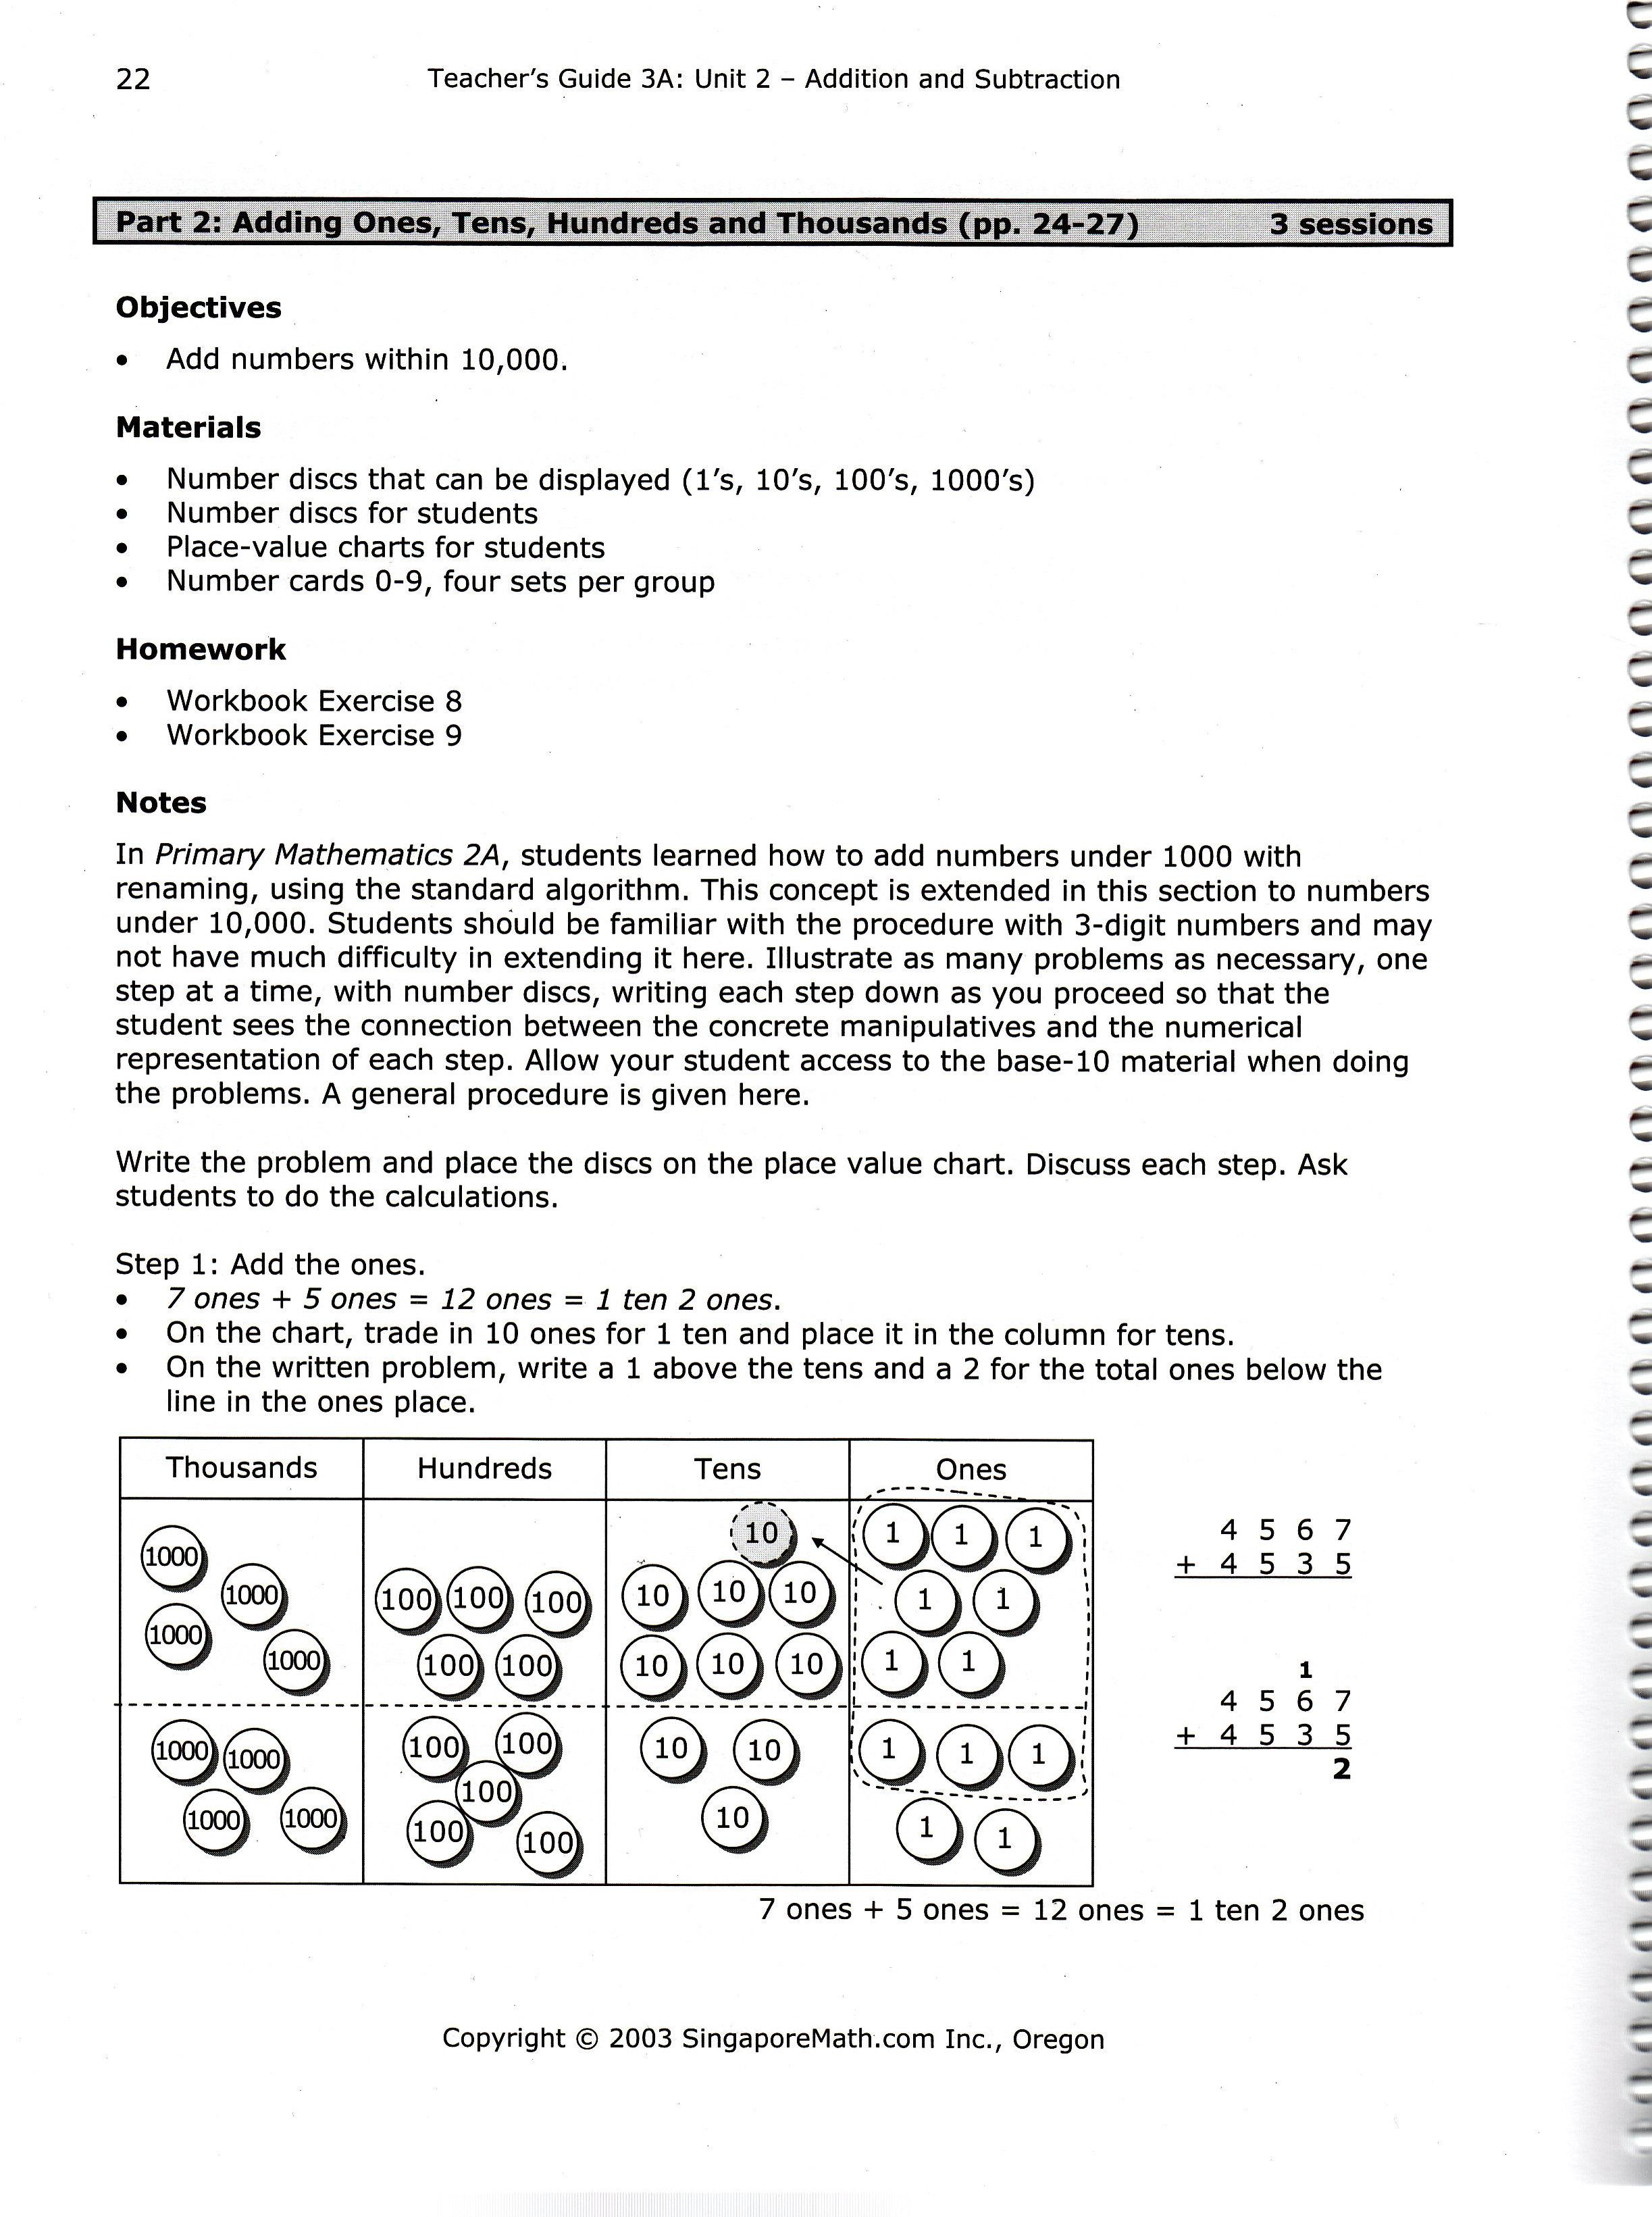 Comparing Singapore Math Materials: Teacher\'s Guides ...